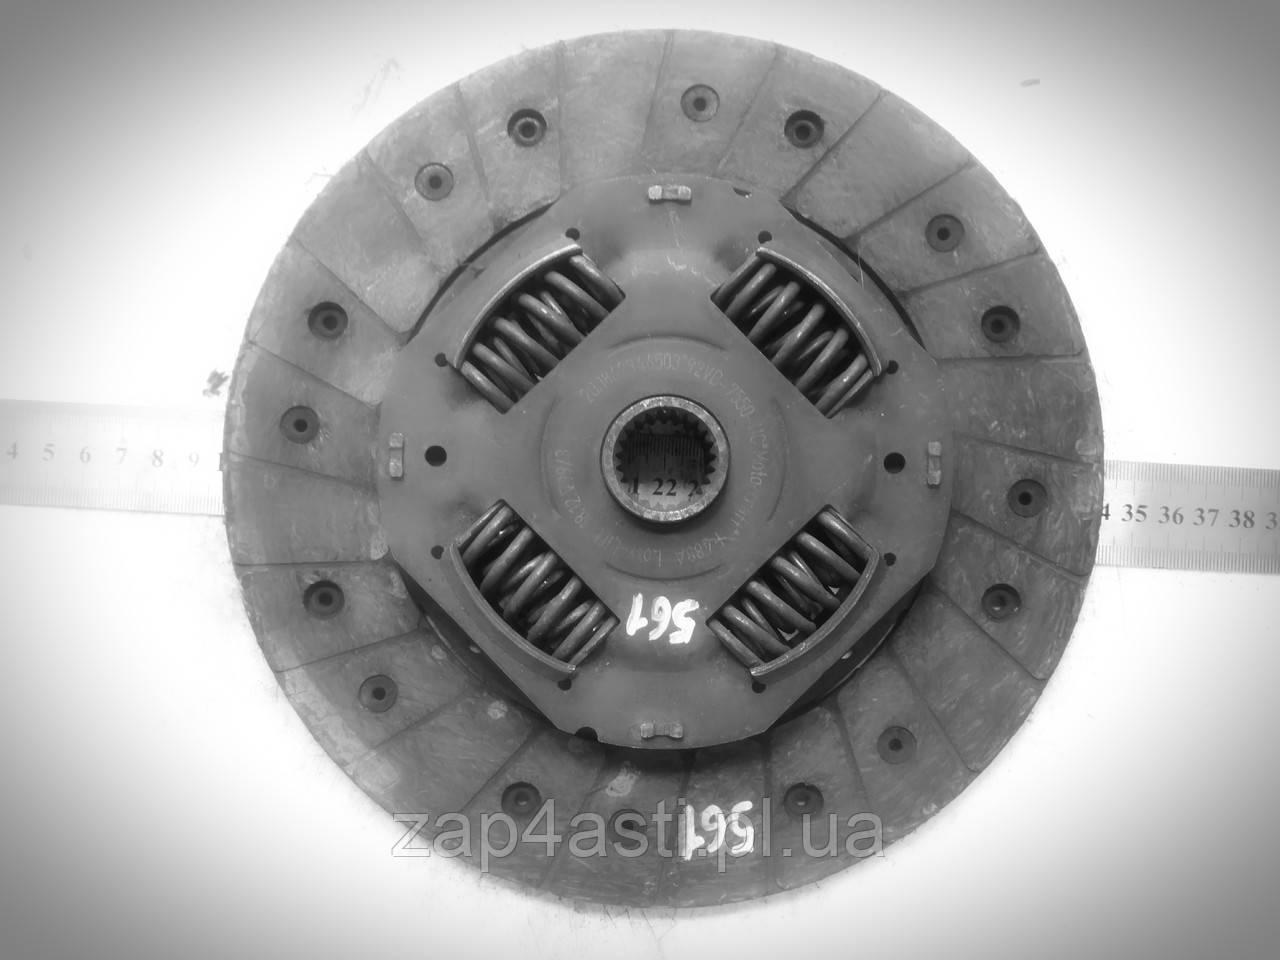 92VB-7550-HC  Диск сцепления Ford Transit 1862346503 SACHS